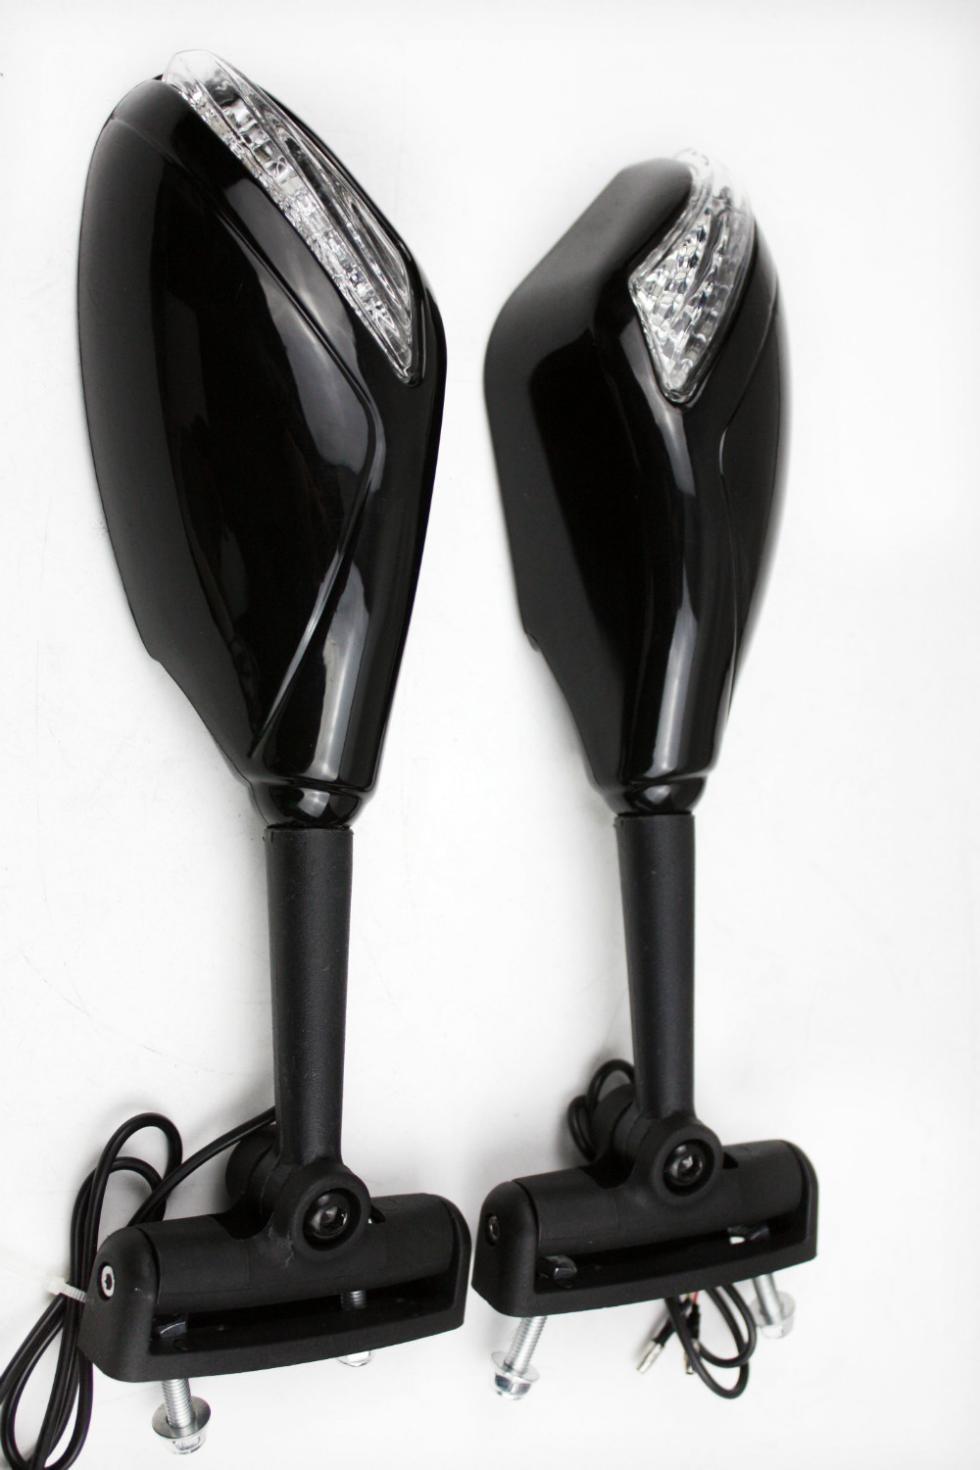 For Motorcycle Honda CBR 600 F4 900 929 954 CBR1000 Turn Signal Yellow LED lights Mirrors